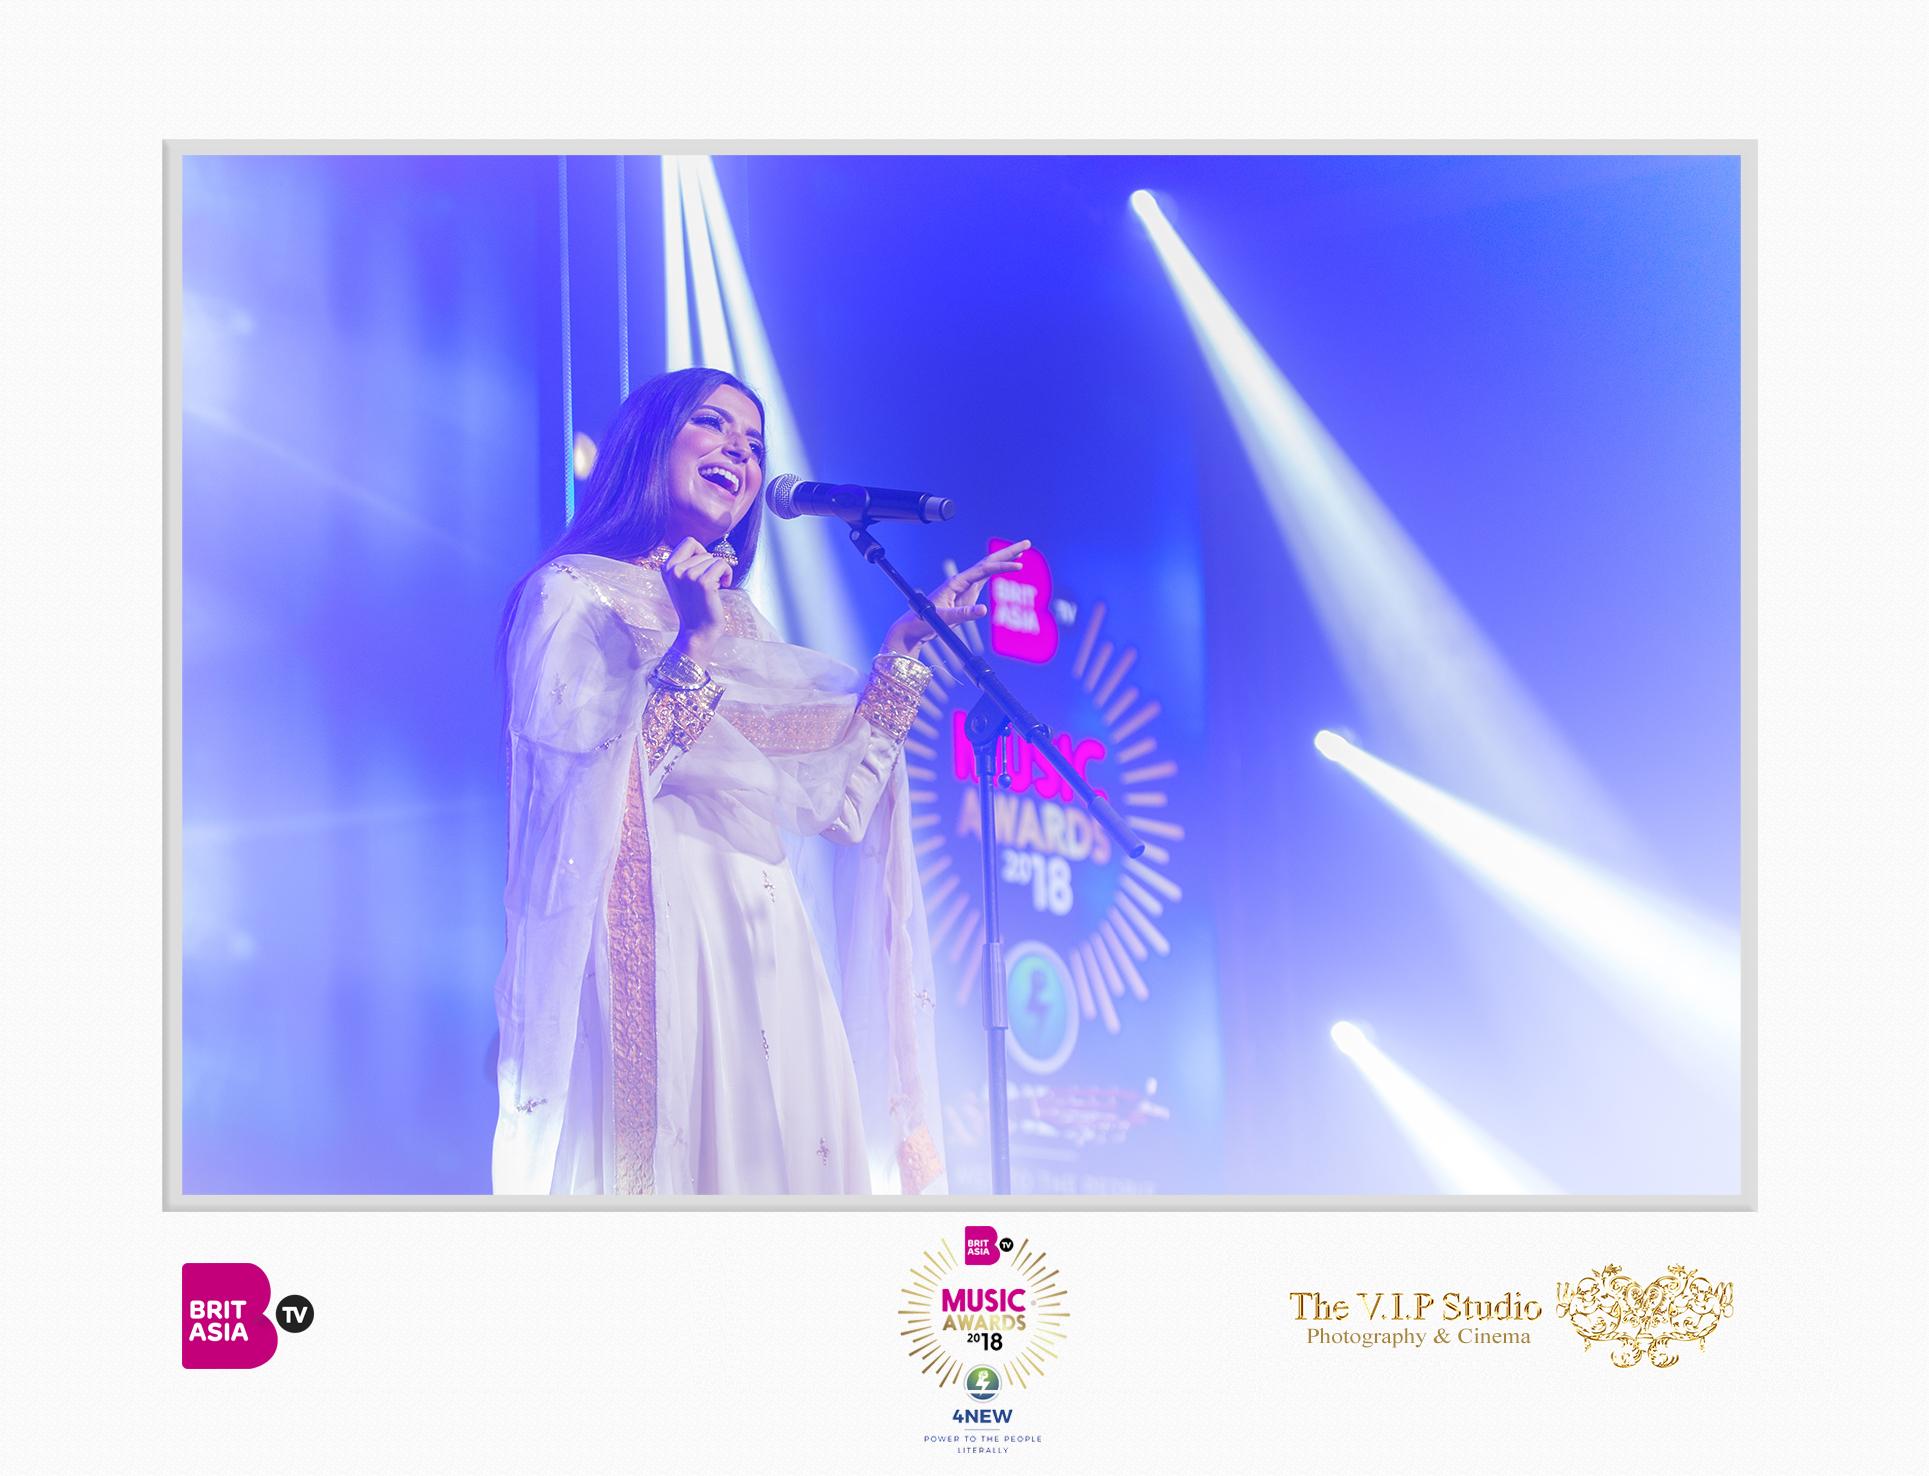 The VIP Studio - BritAsia Music Awards - Nimrat Khaira